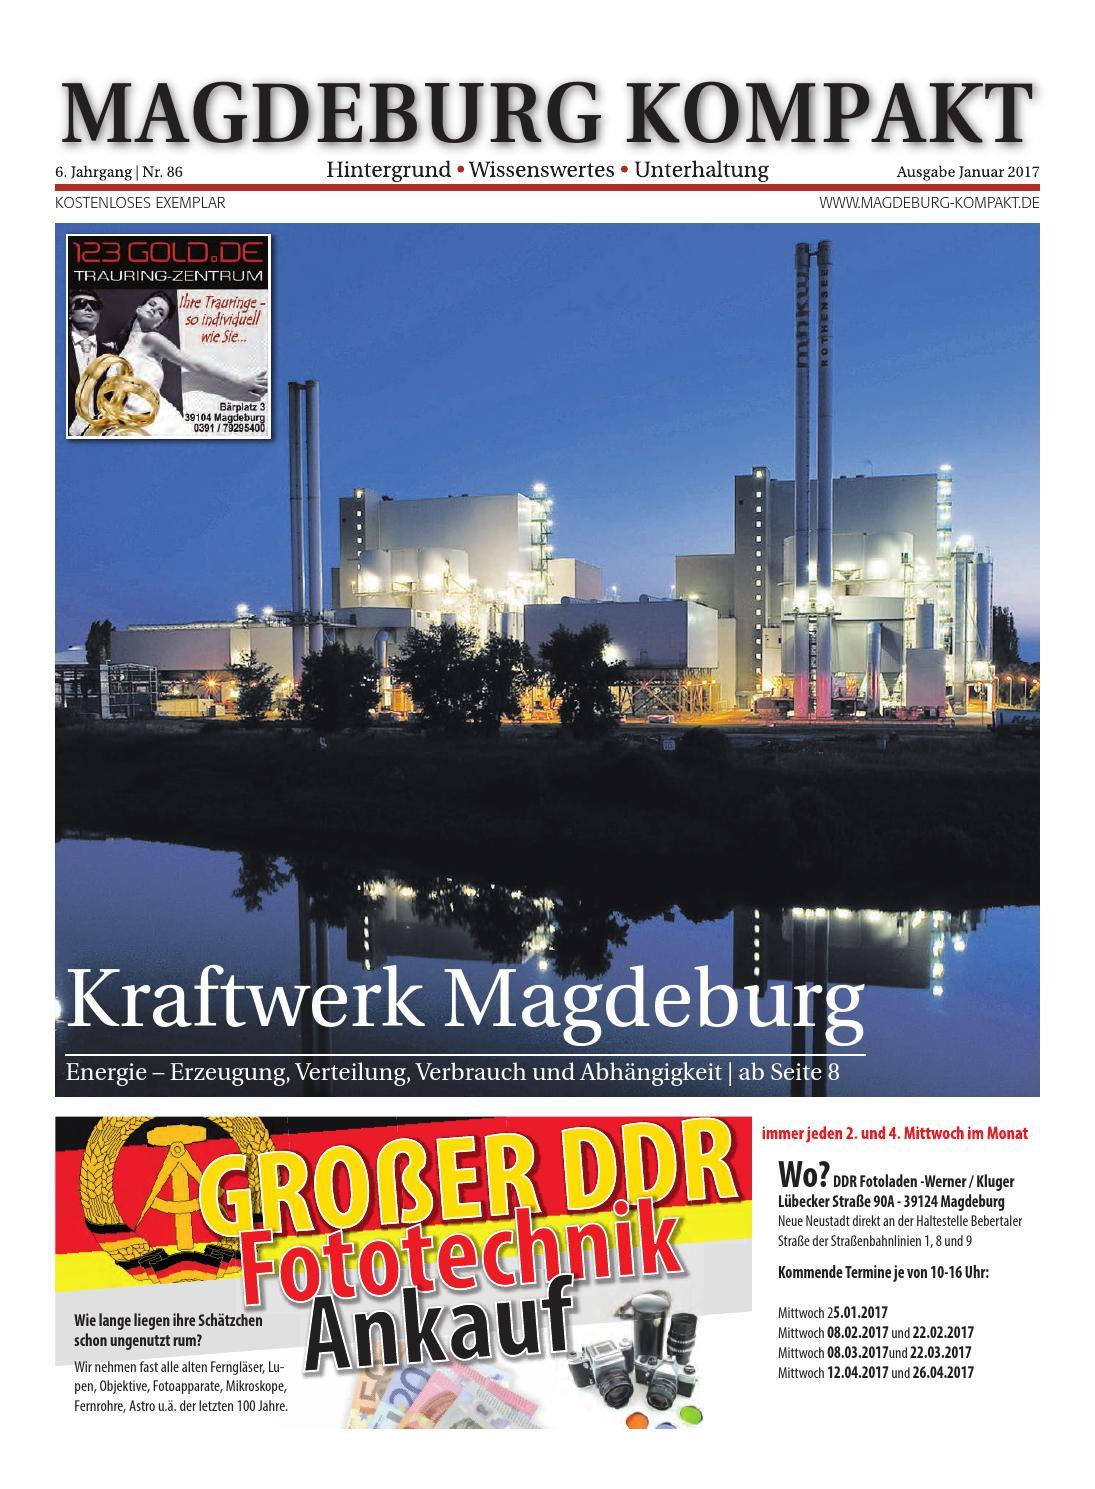 Magdeburg Kompakt Nr 86 By Magdeburg Kompakt Issuu